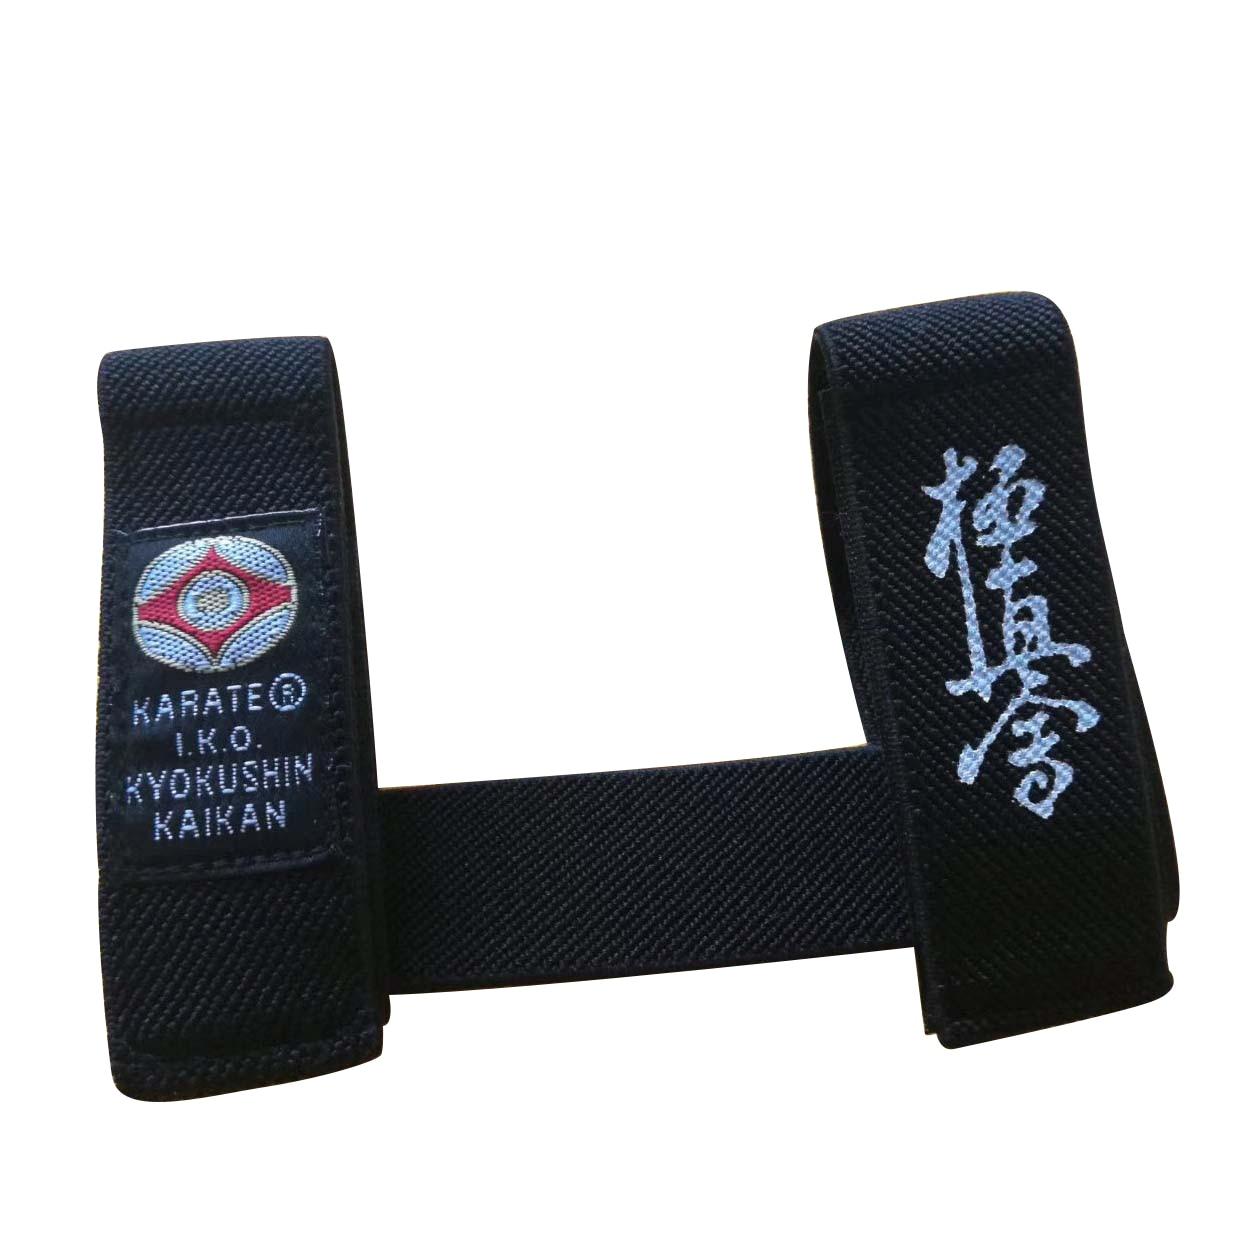 Sinobudo IKO Kyokushin Karate Belt Fixer Karate Kyokushin Kai Belt Fixed Retainer Black Belt Fixer